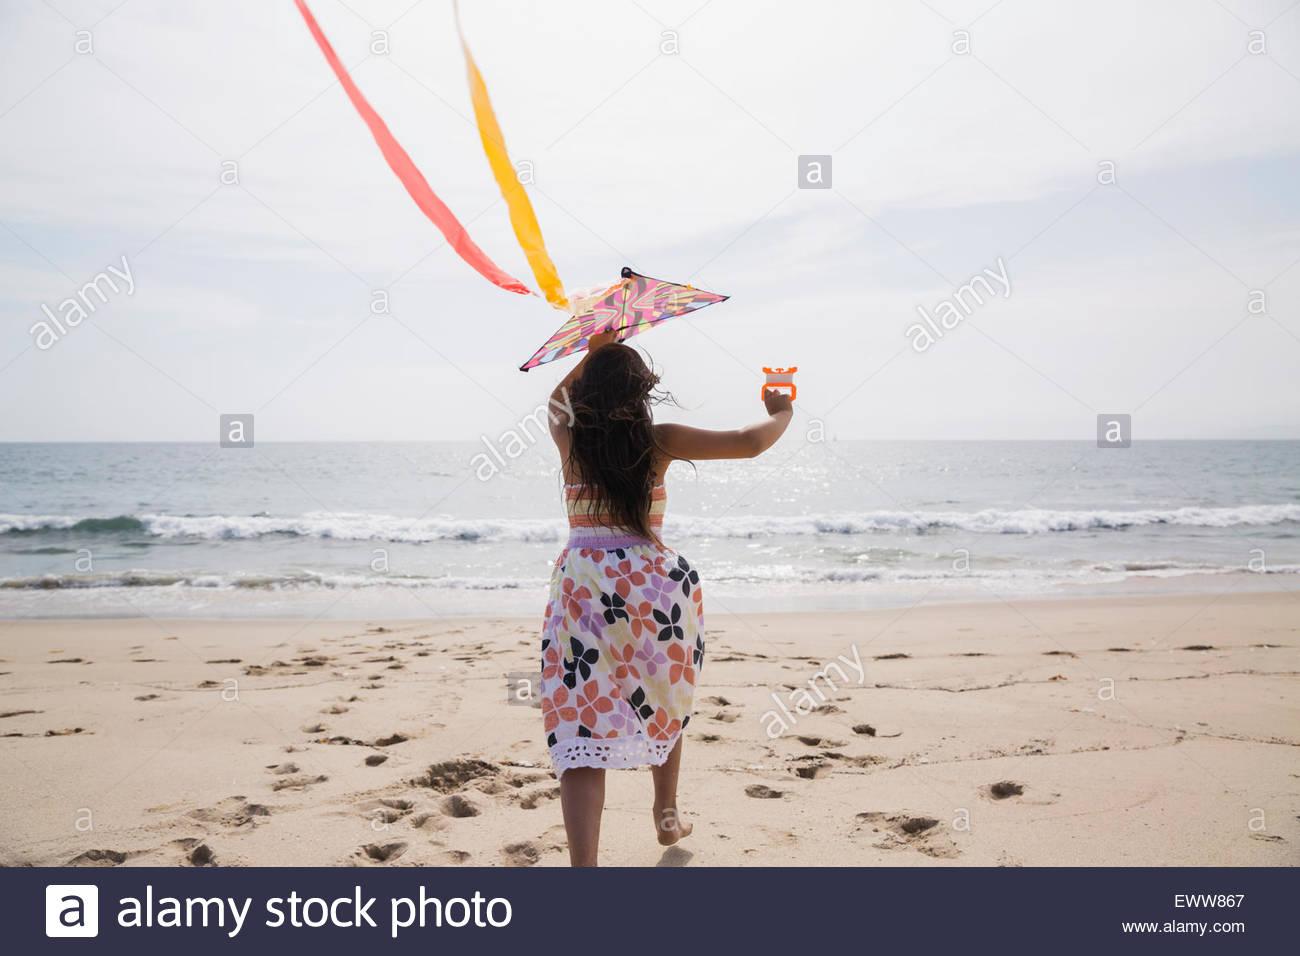 Mädchen im Kleid Drachen am Sonnenstrand Stockbild